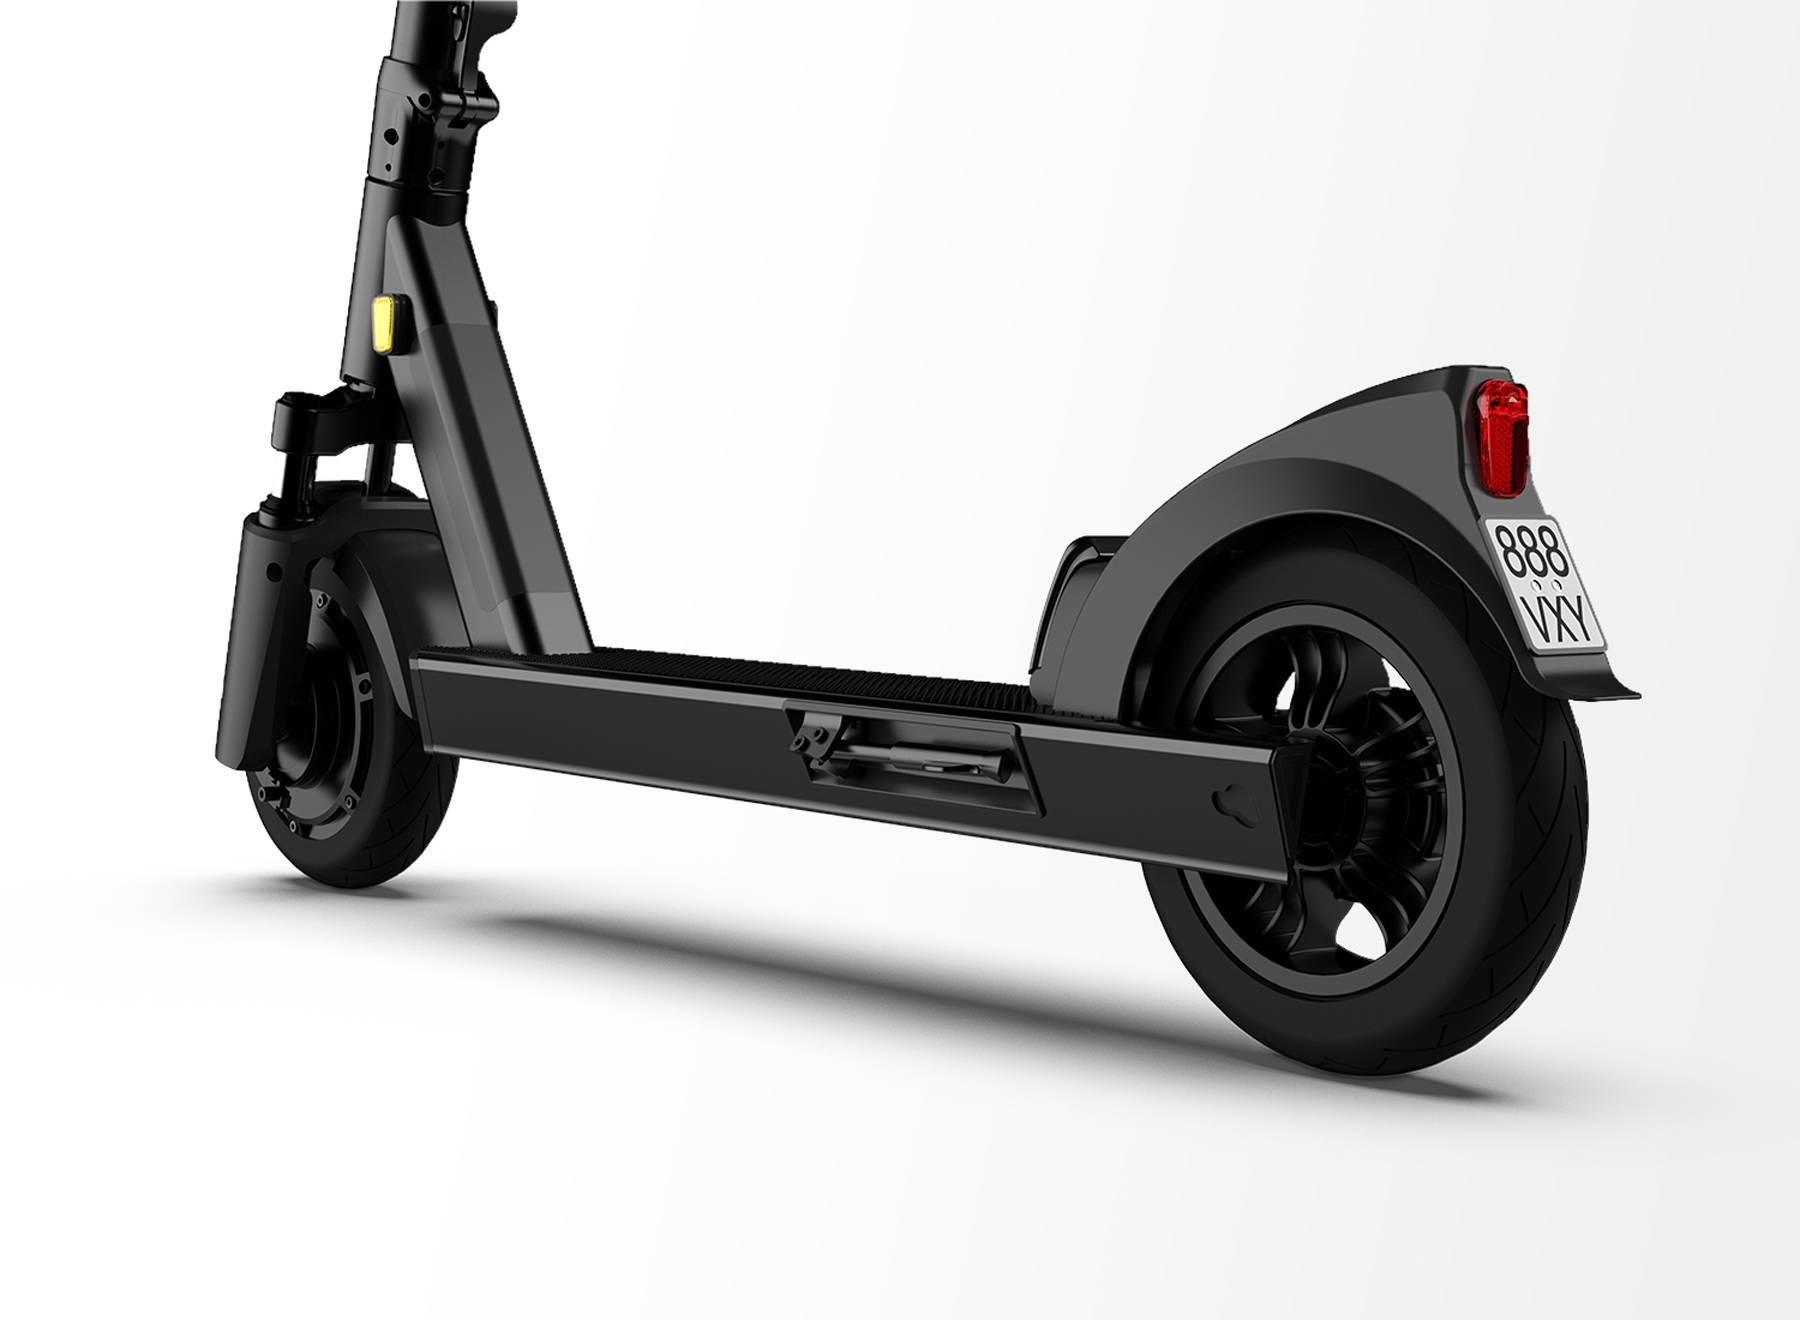 okai-es200-escooter-back-wheel-deck-kickstand